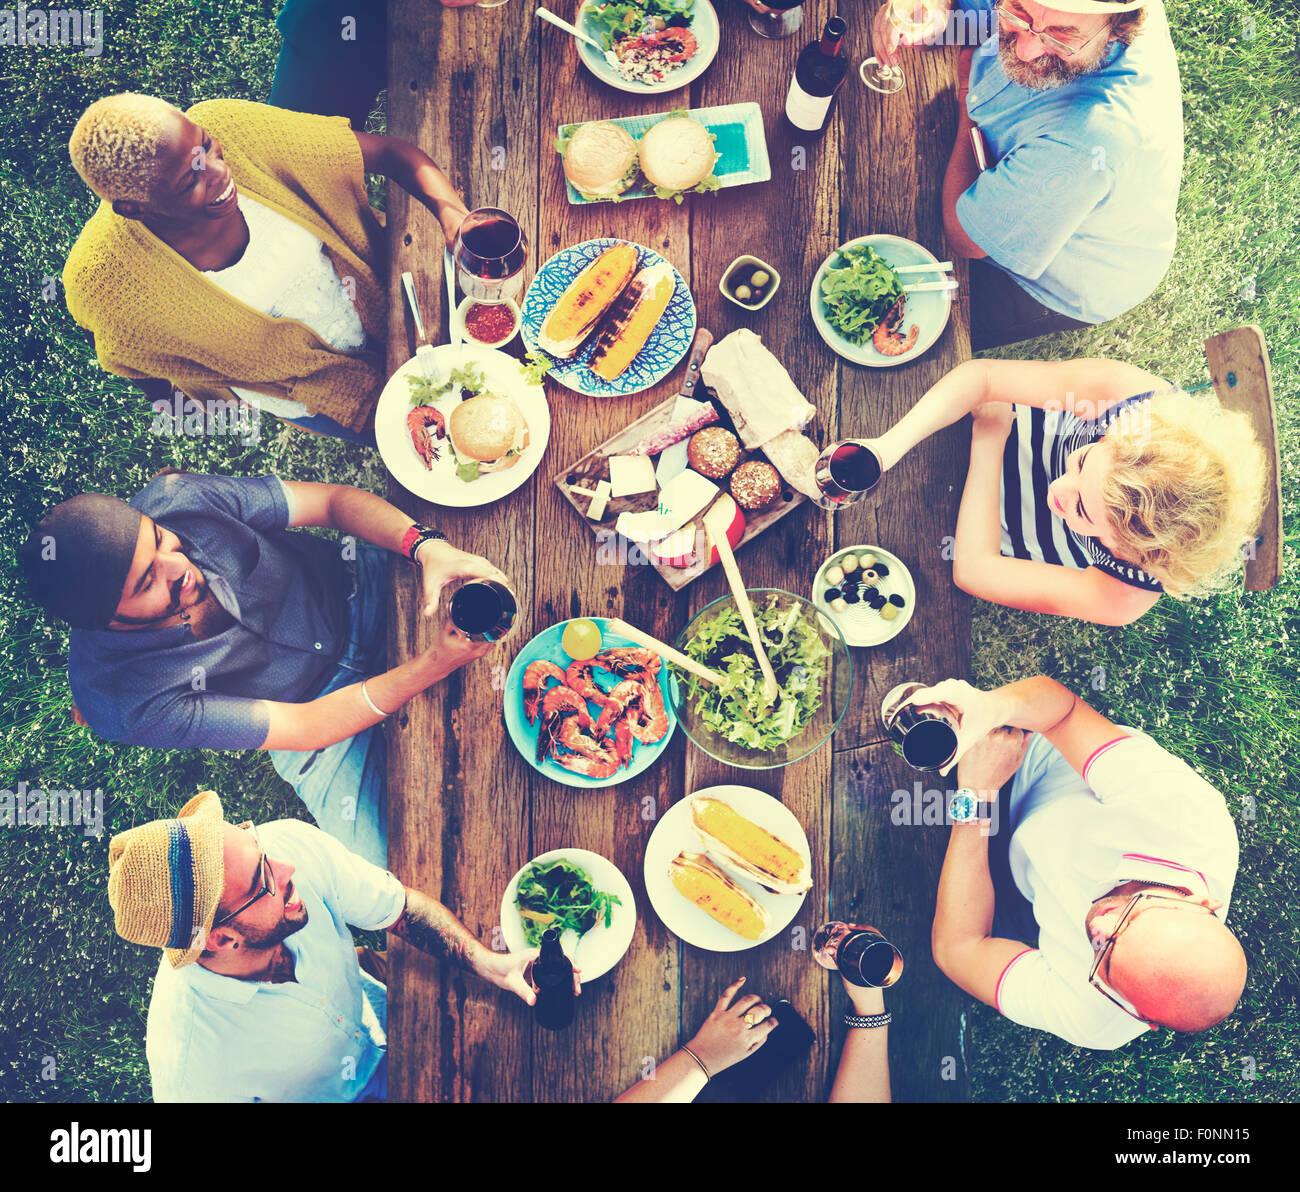 Freunde Freundschaft Außengastronomie Menschen Konzept Stockbild